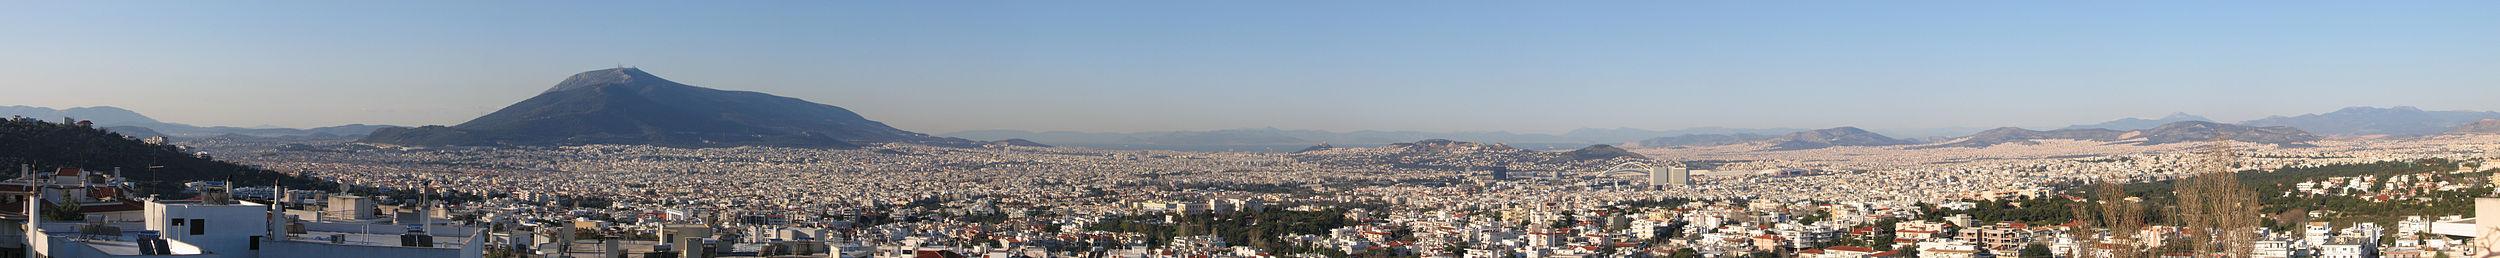 Panorama da cidade vista do Areópago